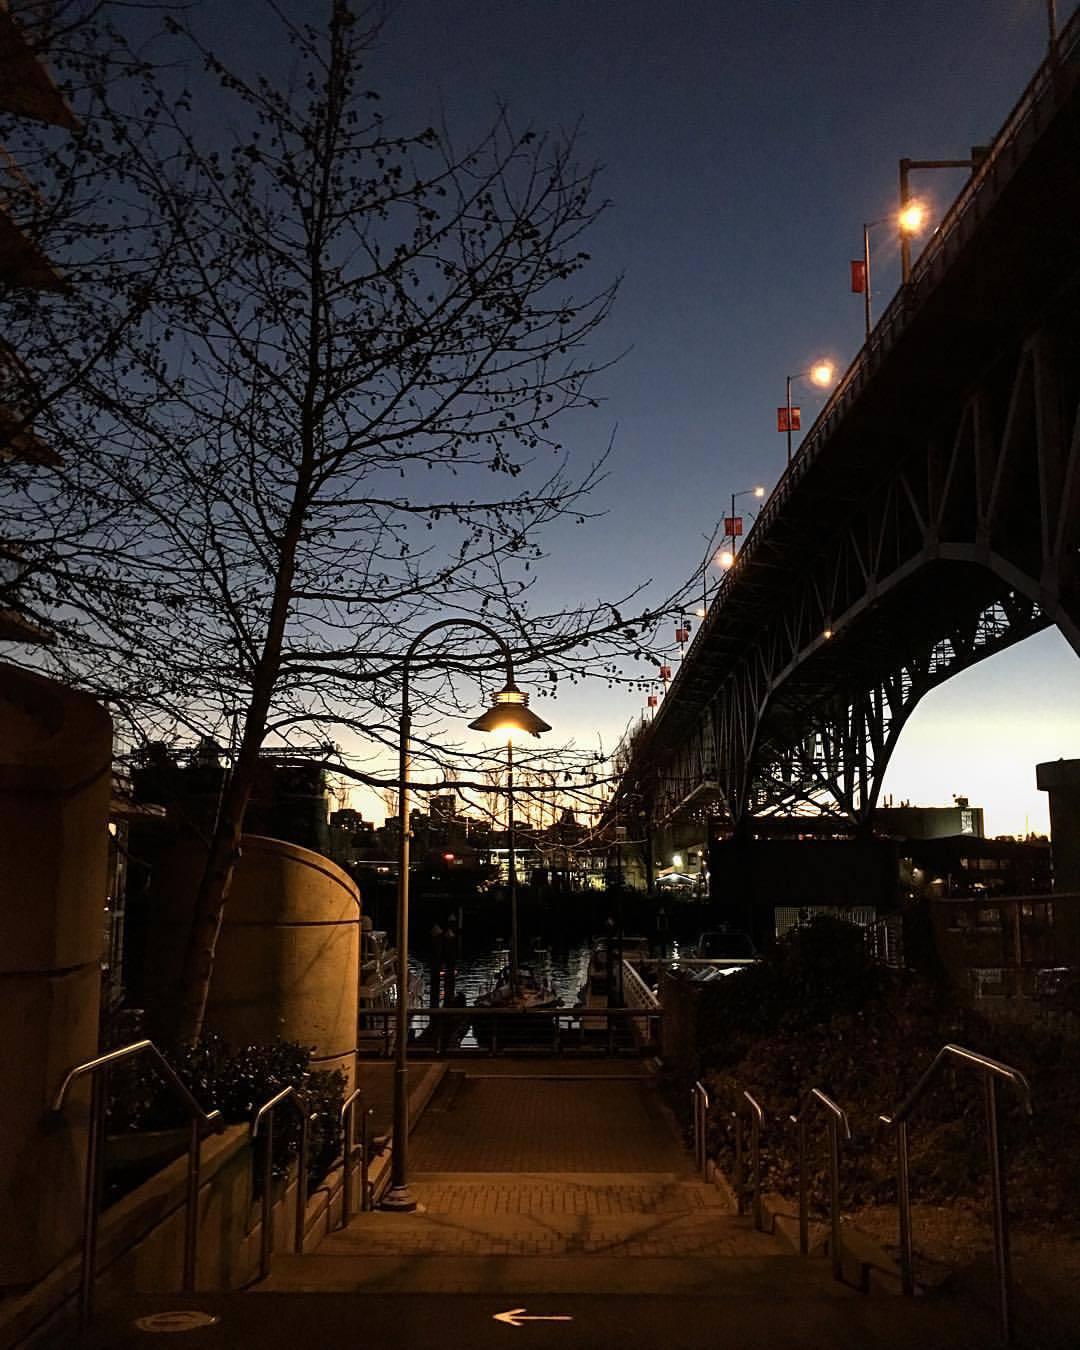 To the left. (at Granville Street Bridge)